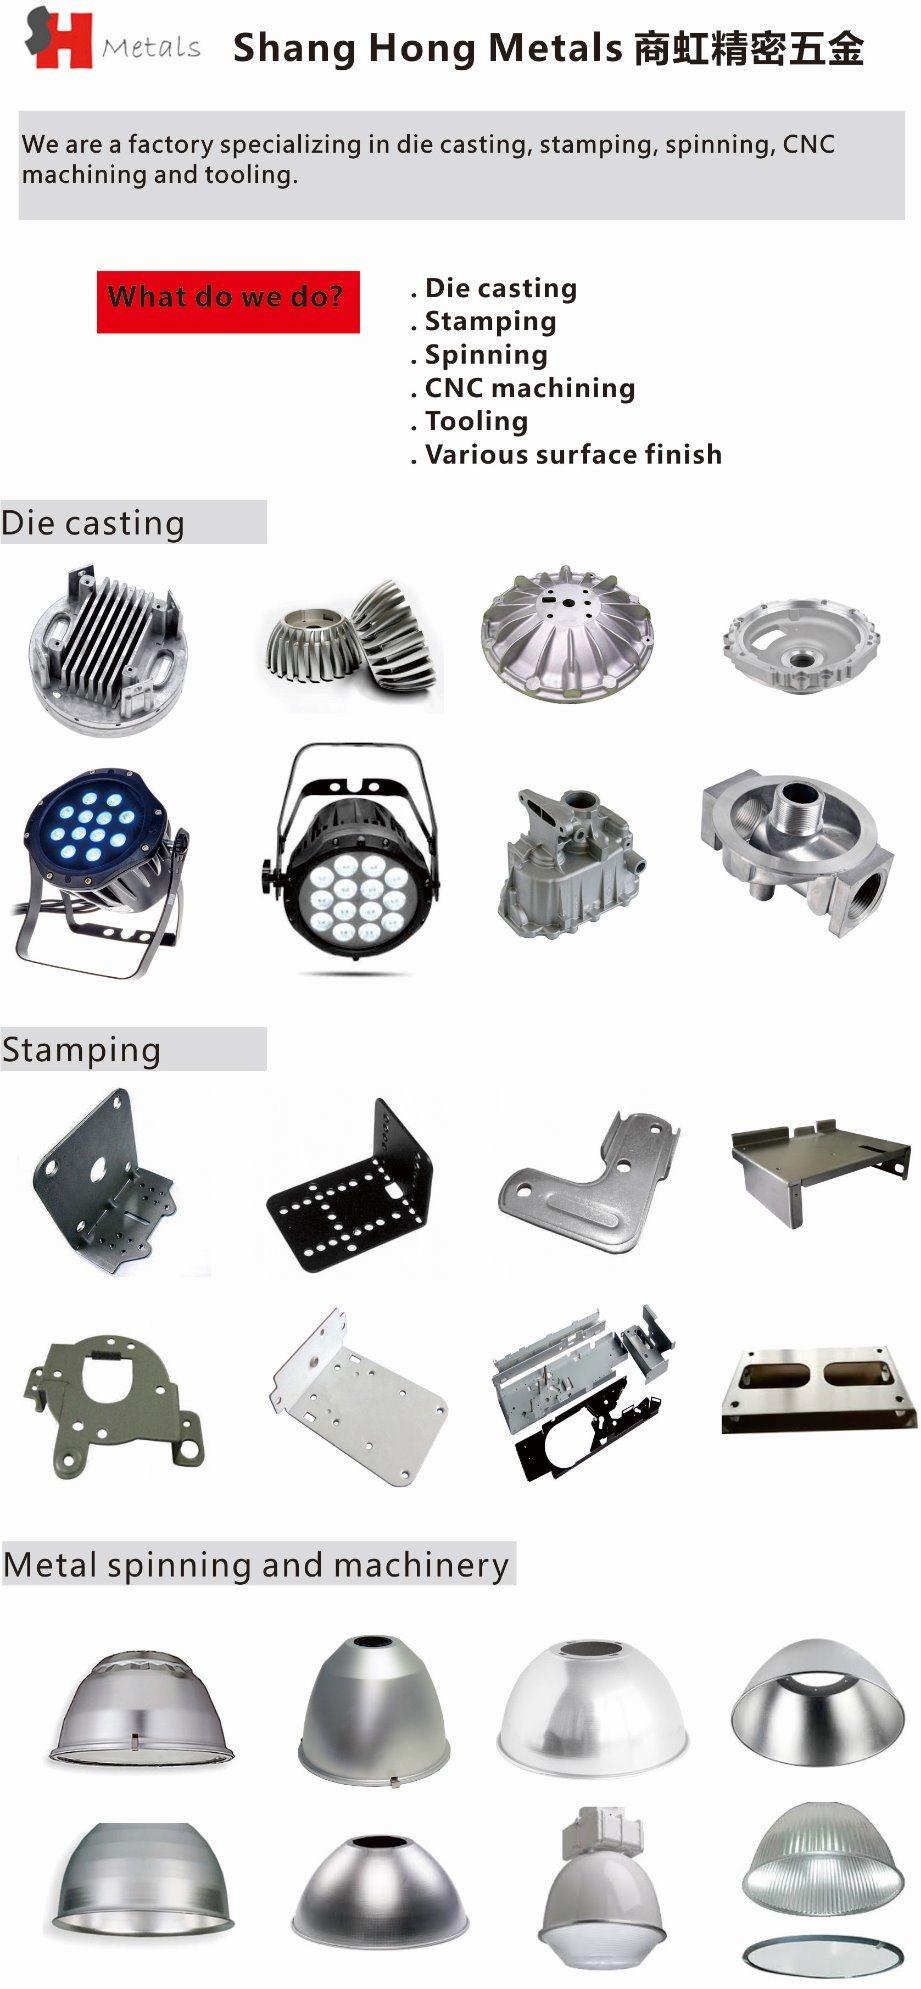 Customized Metal Punching / Metal Stamping / Metal Pressing & Sheet Metal Stamping Part with Machining Process for Auto Parts